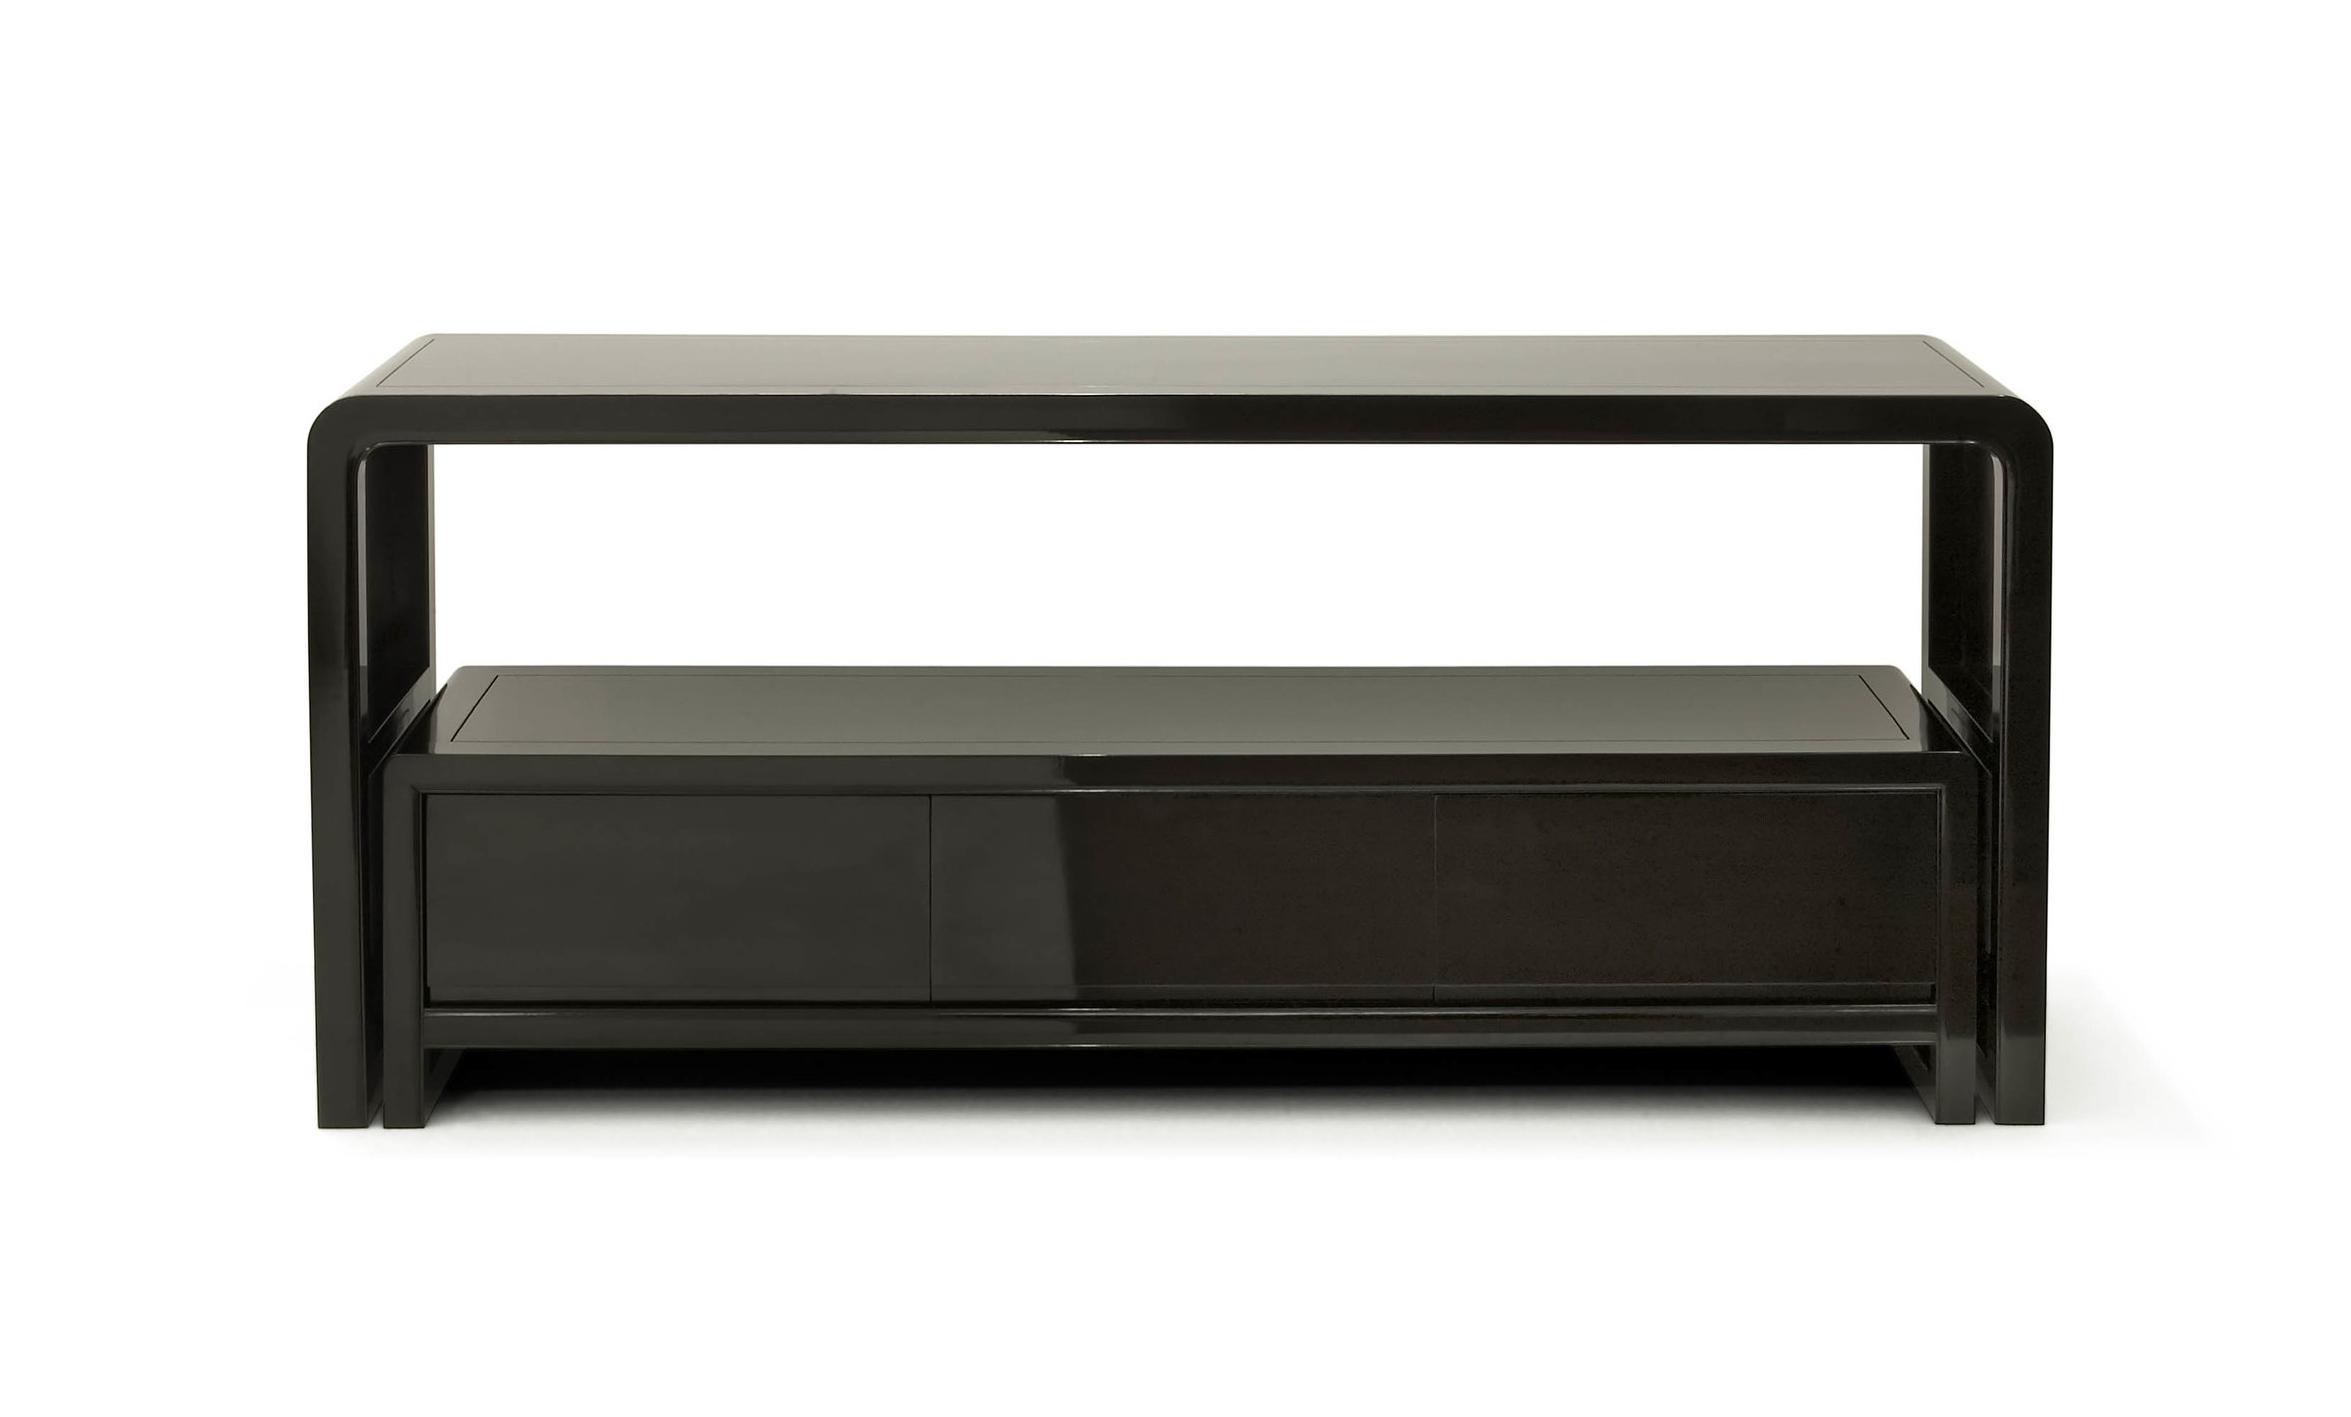 ....bespoke chinese ming style furniture : tv cabinet ..特别定制中式明式家具 : 电视柜....